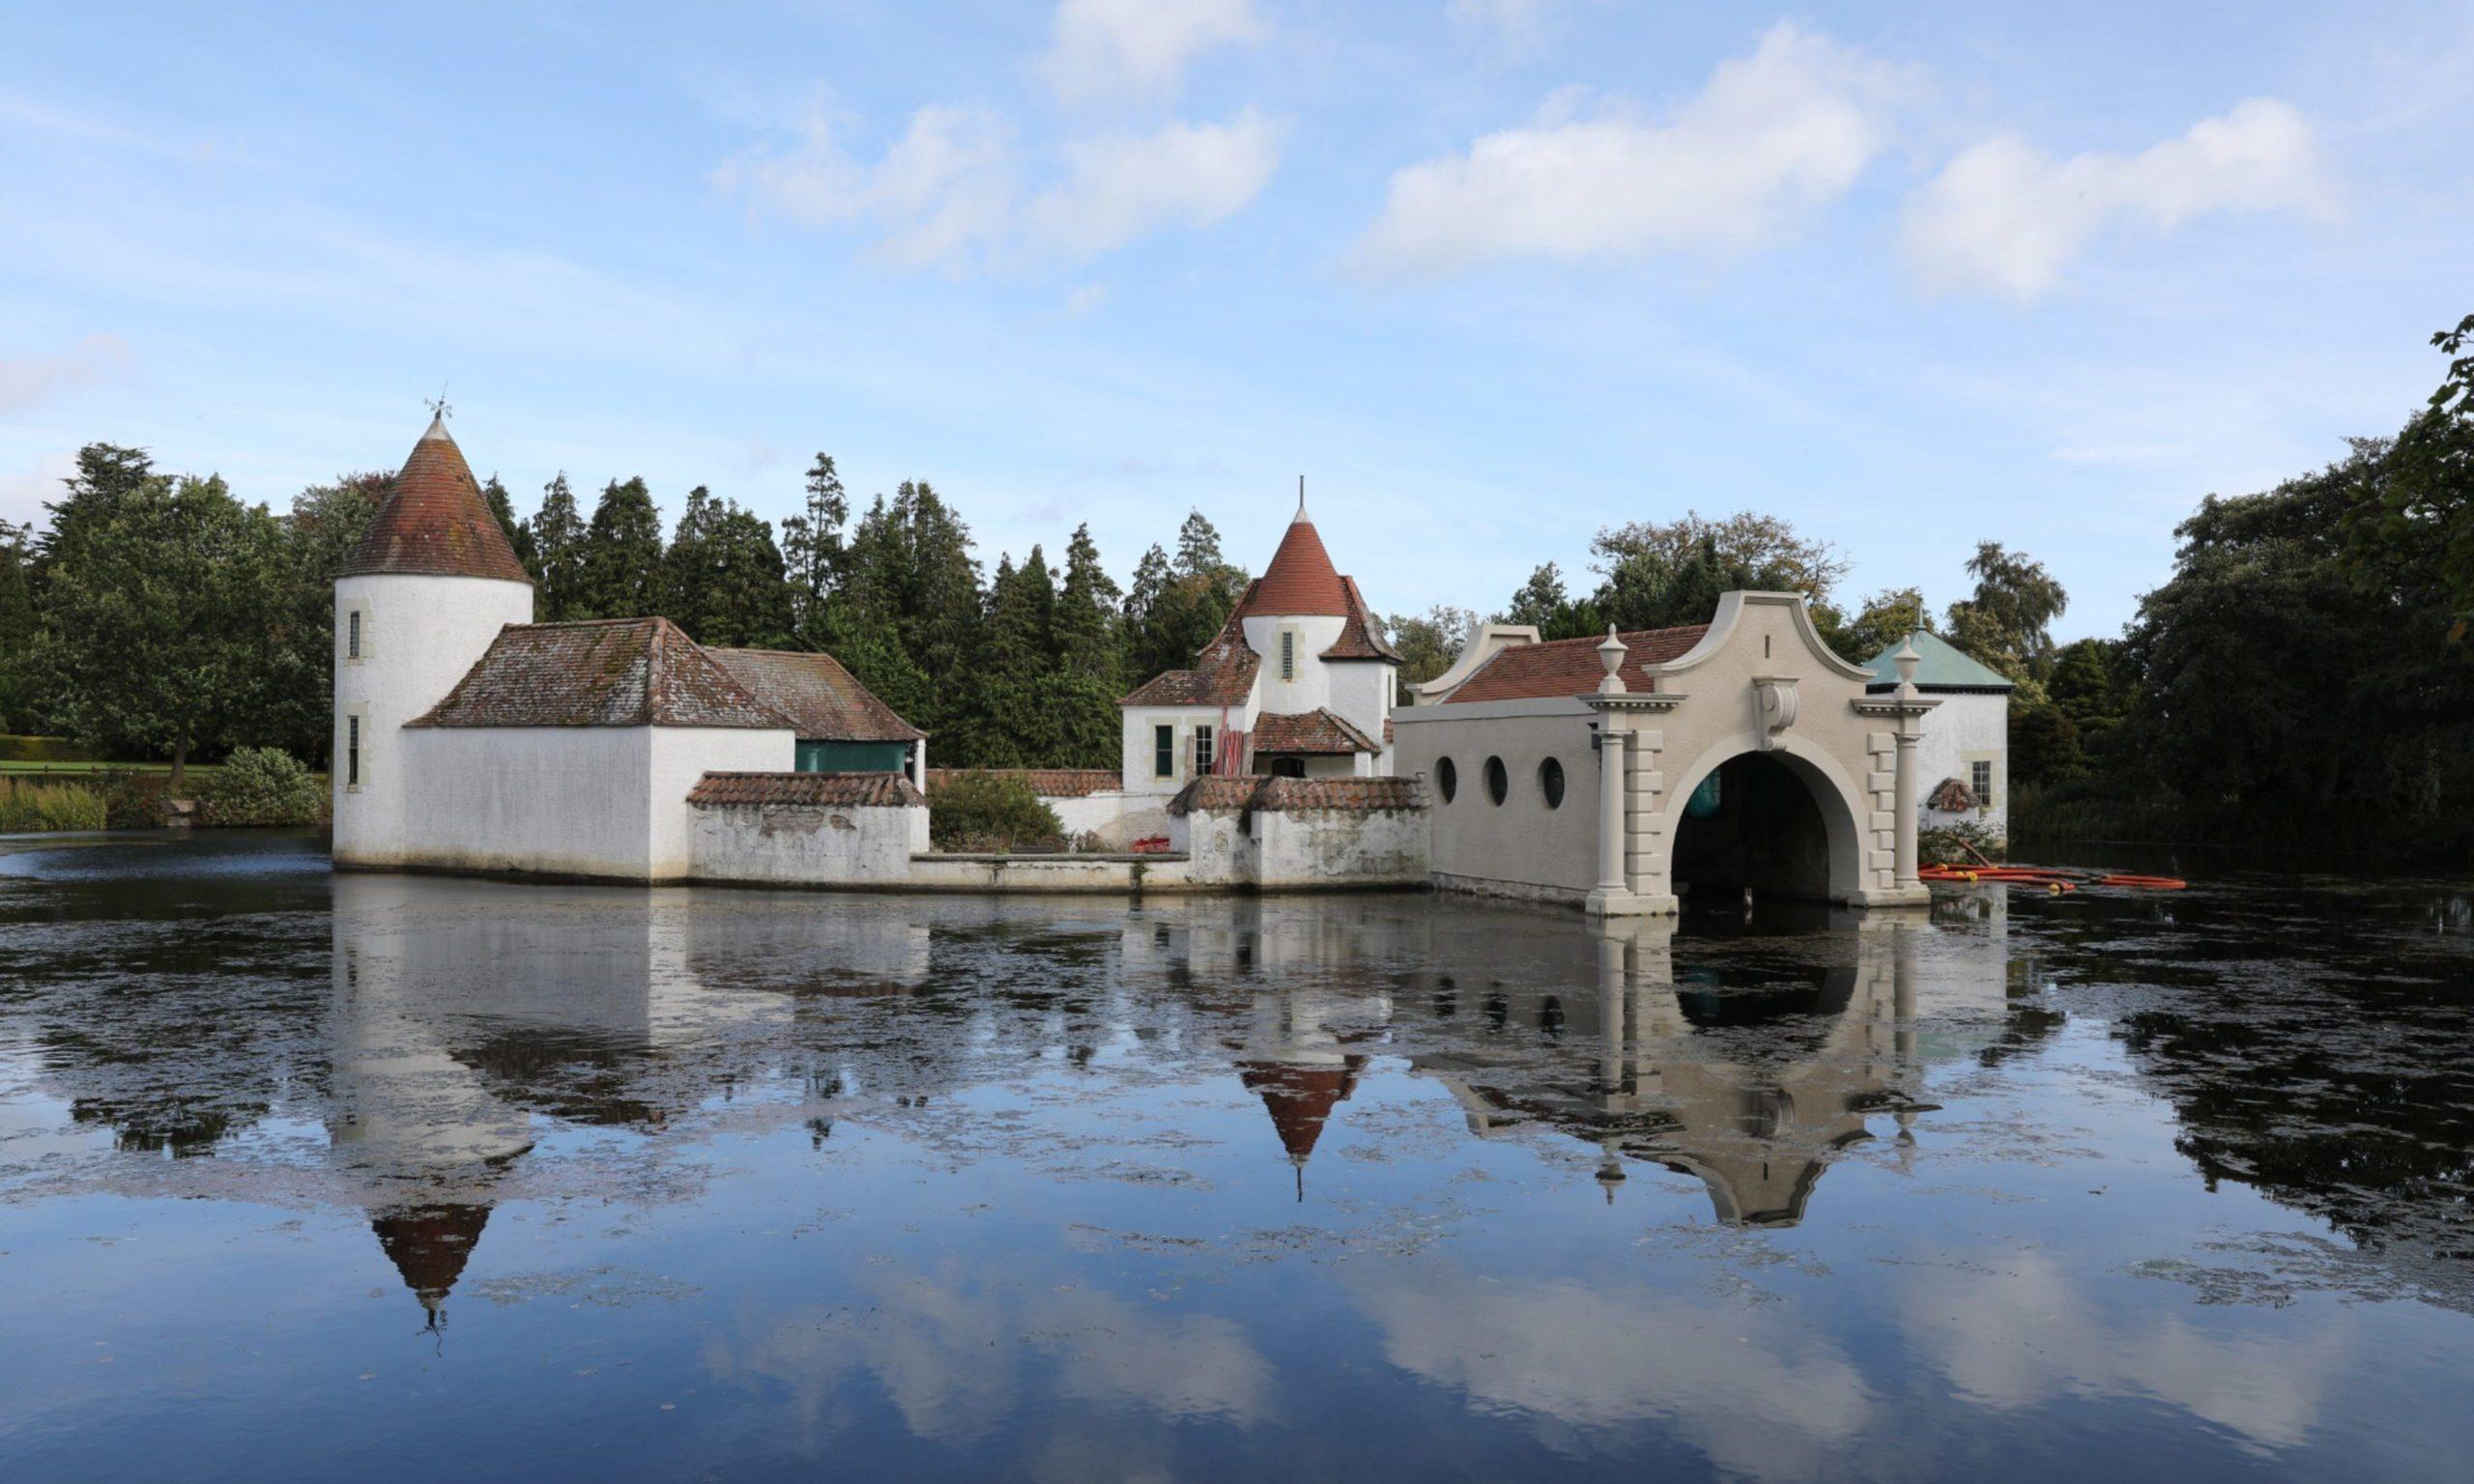 The Dutch Village at Craigtoun Park.